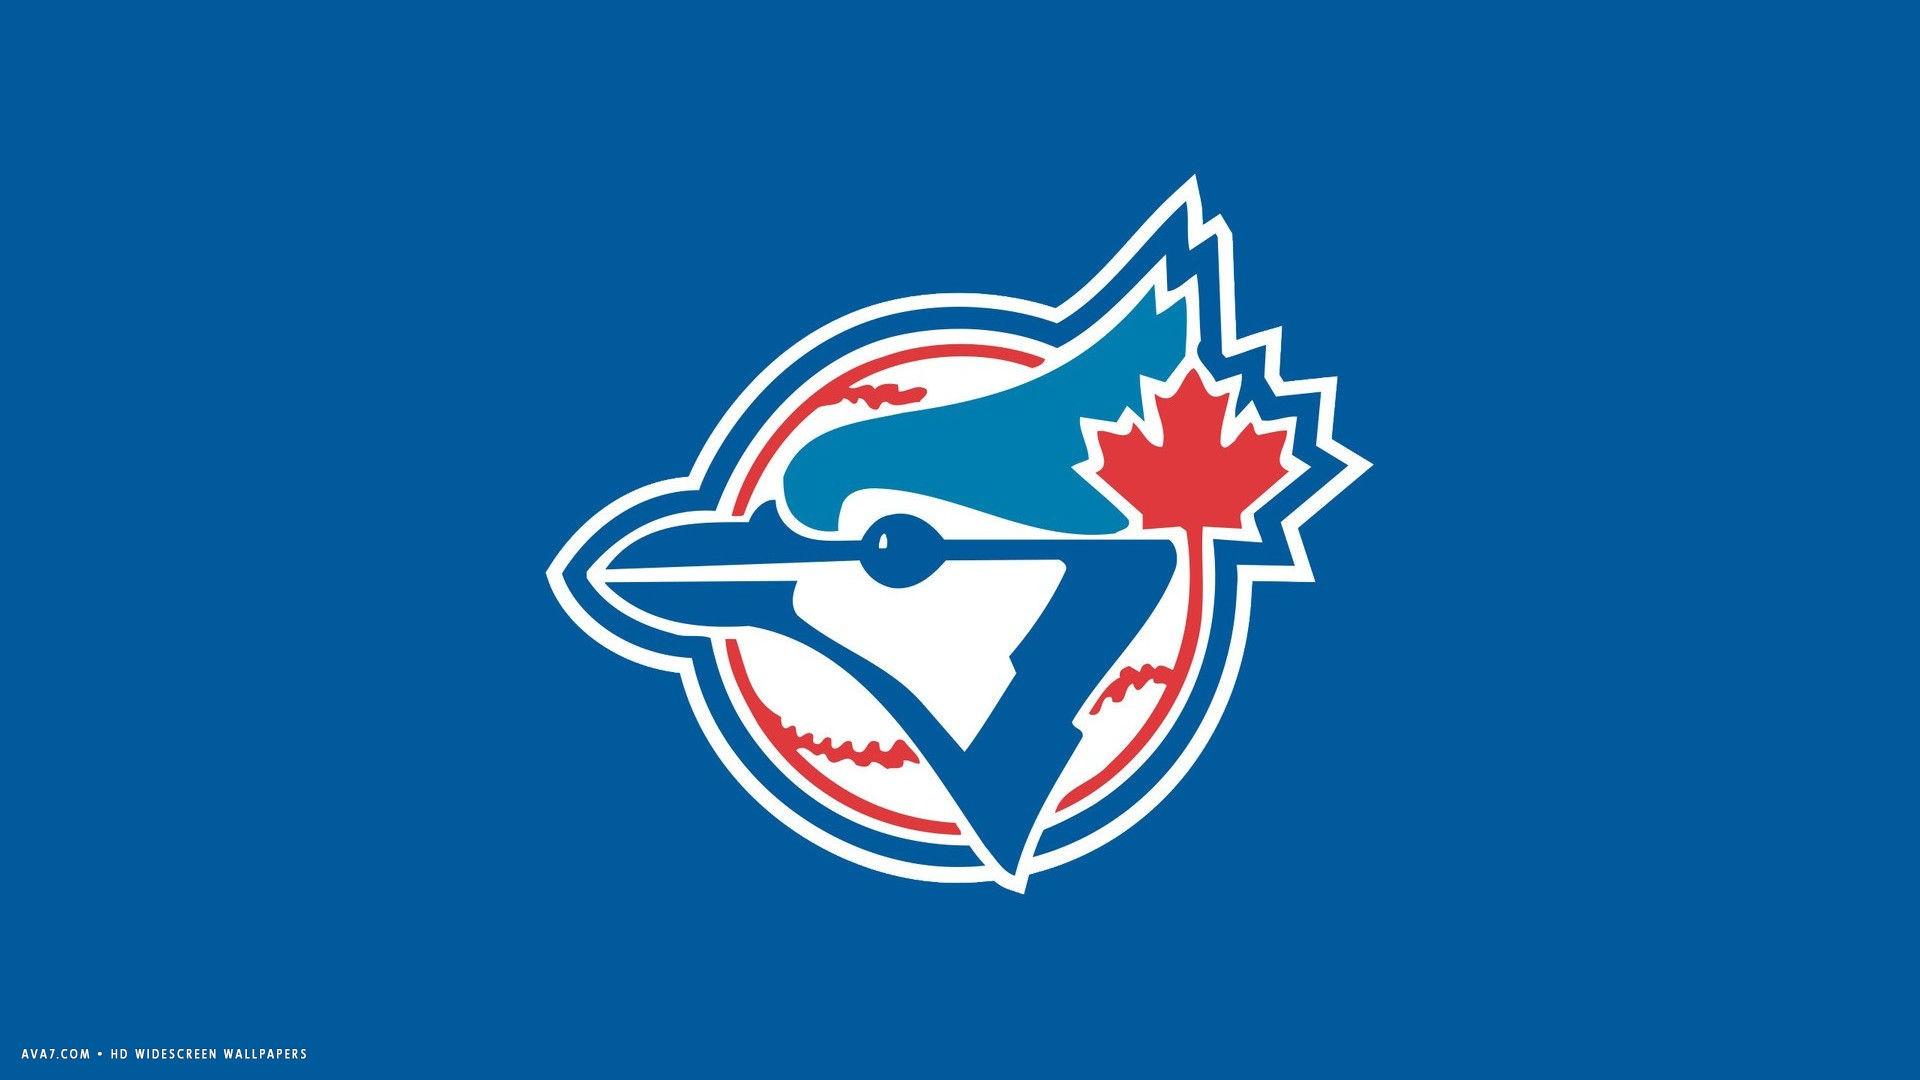 toronto blue jays mlb baseball team hd widescreen wallpaper / baseball .